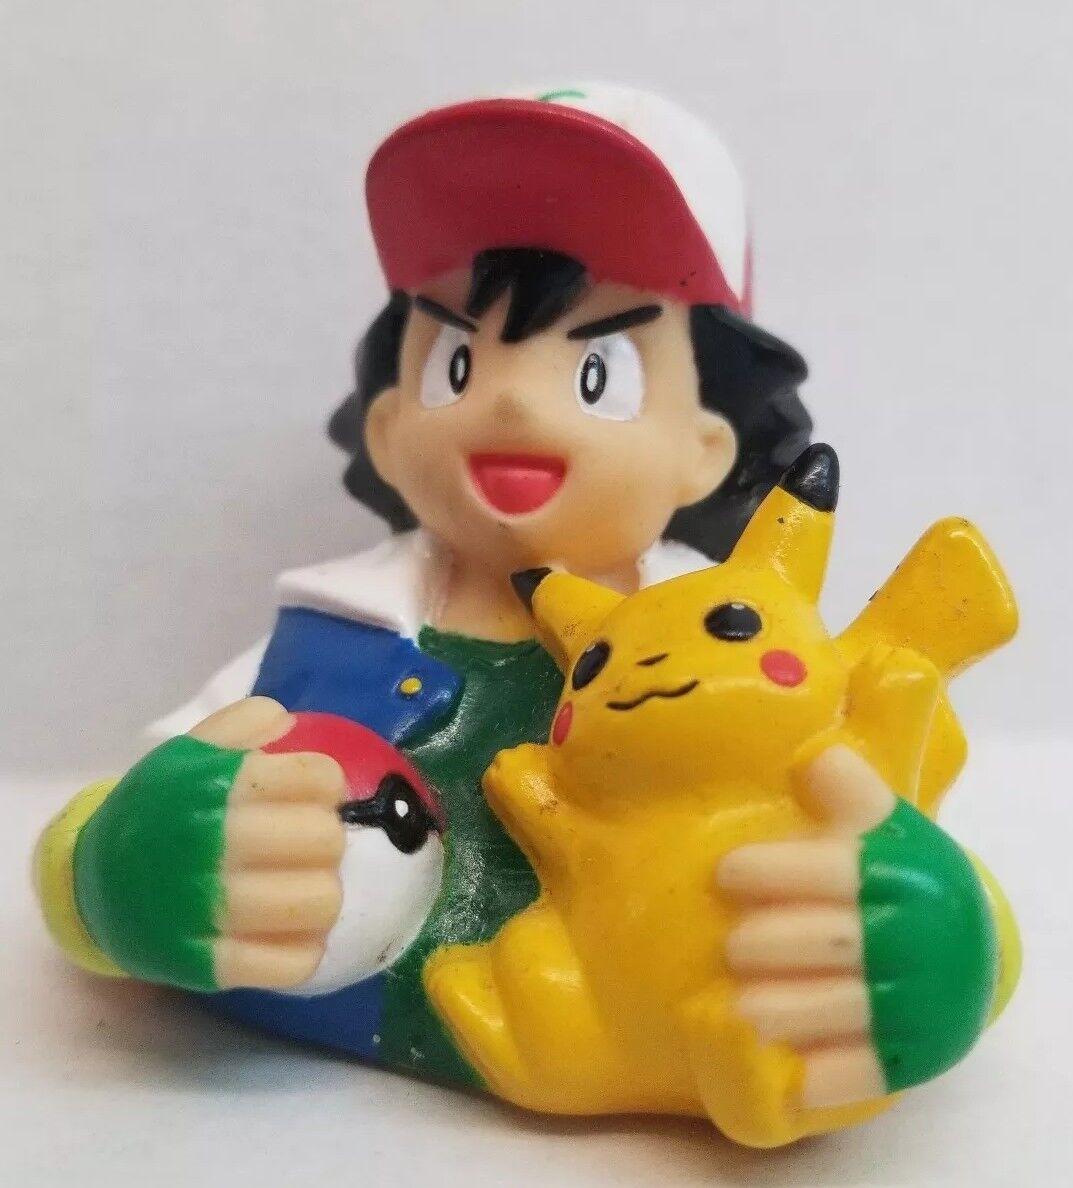 Rare Good Smile Pokemon Ash Ketchum and Pikachu Nendoroid  Figure Toy